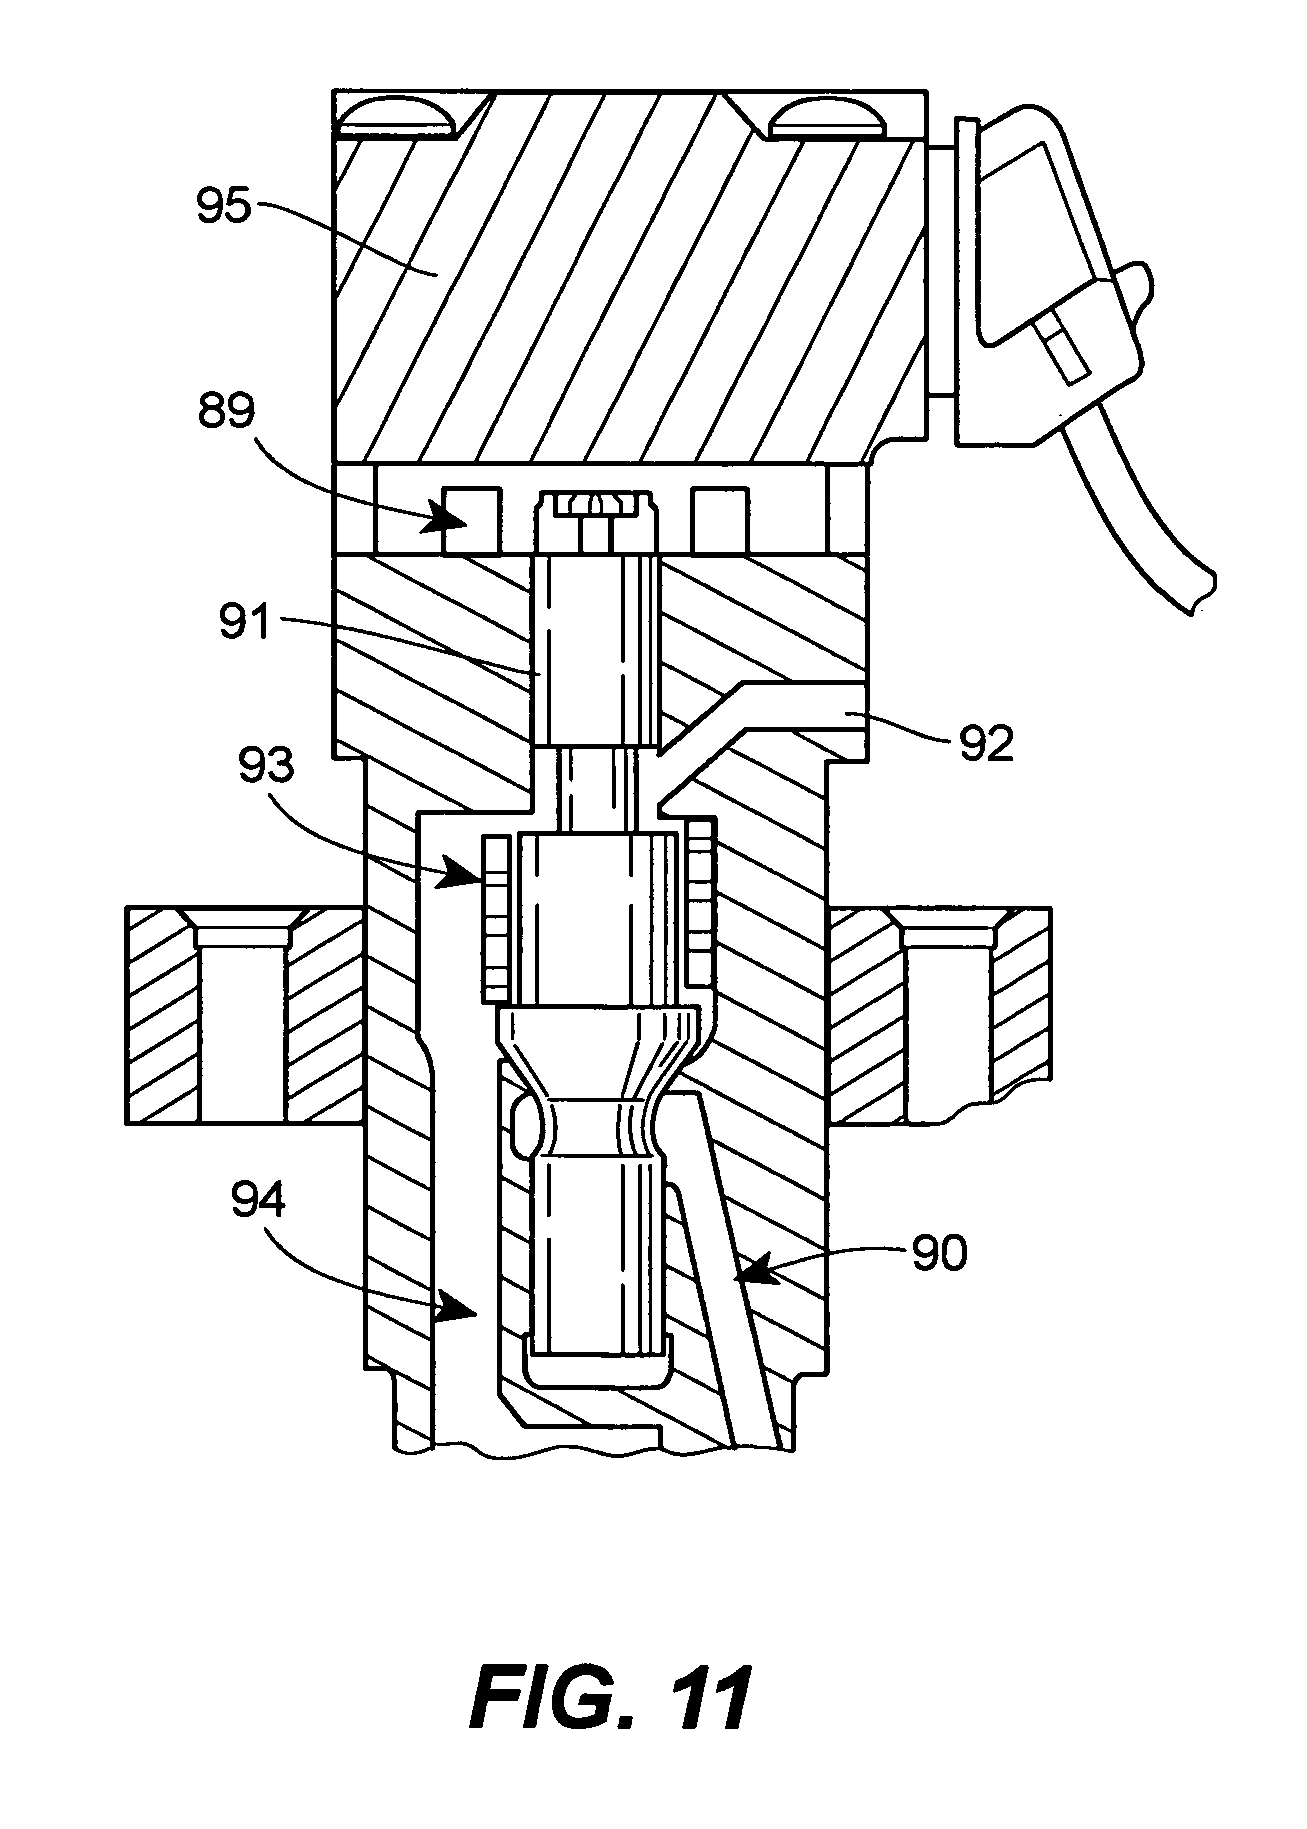 miller cycle engine diagram 1999 patent us7347171 - engine valve actuator providing miller ...